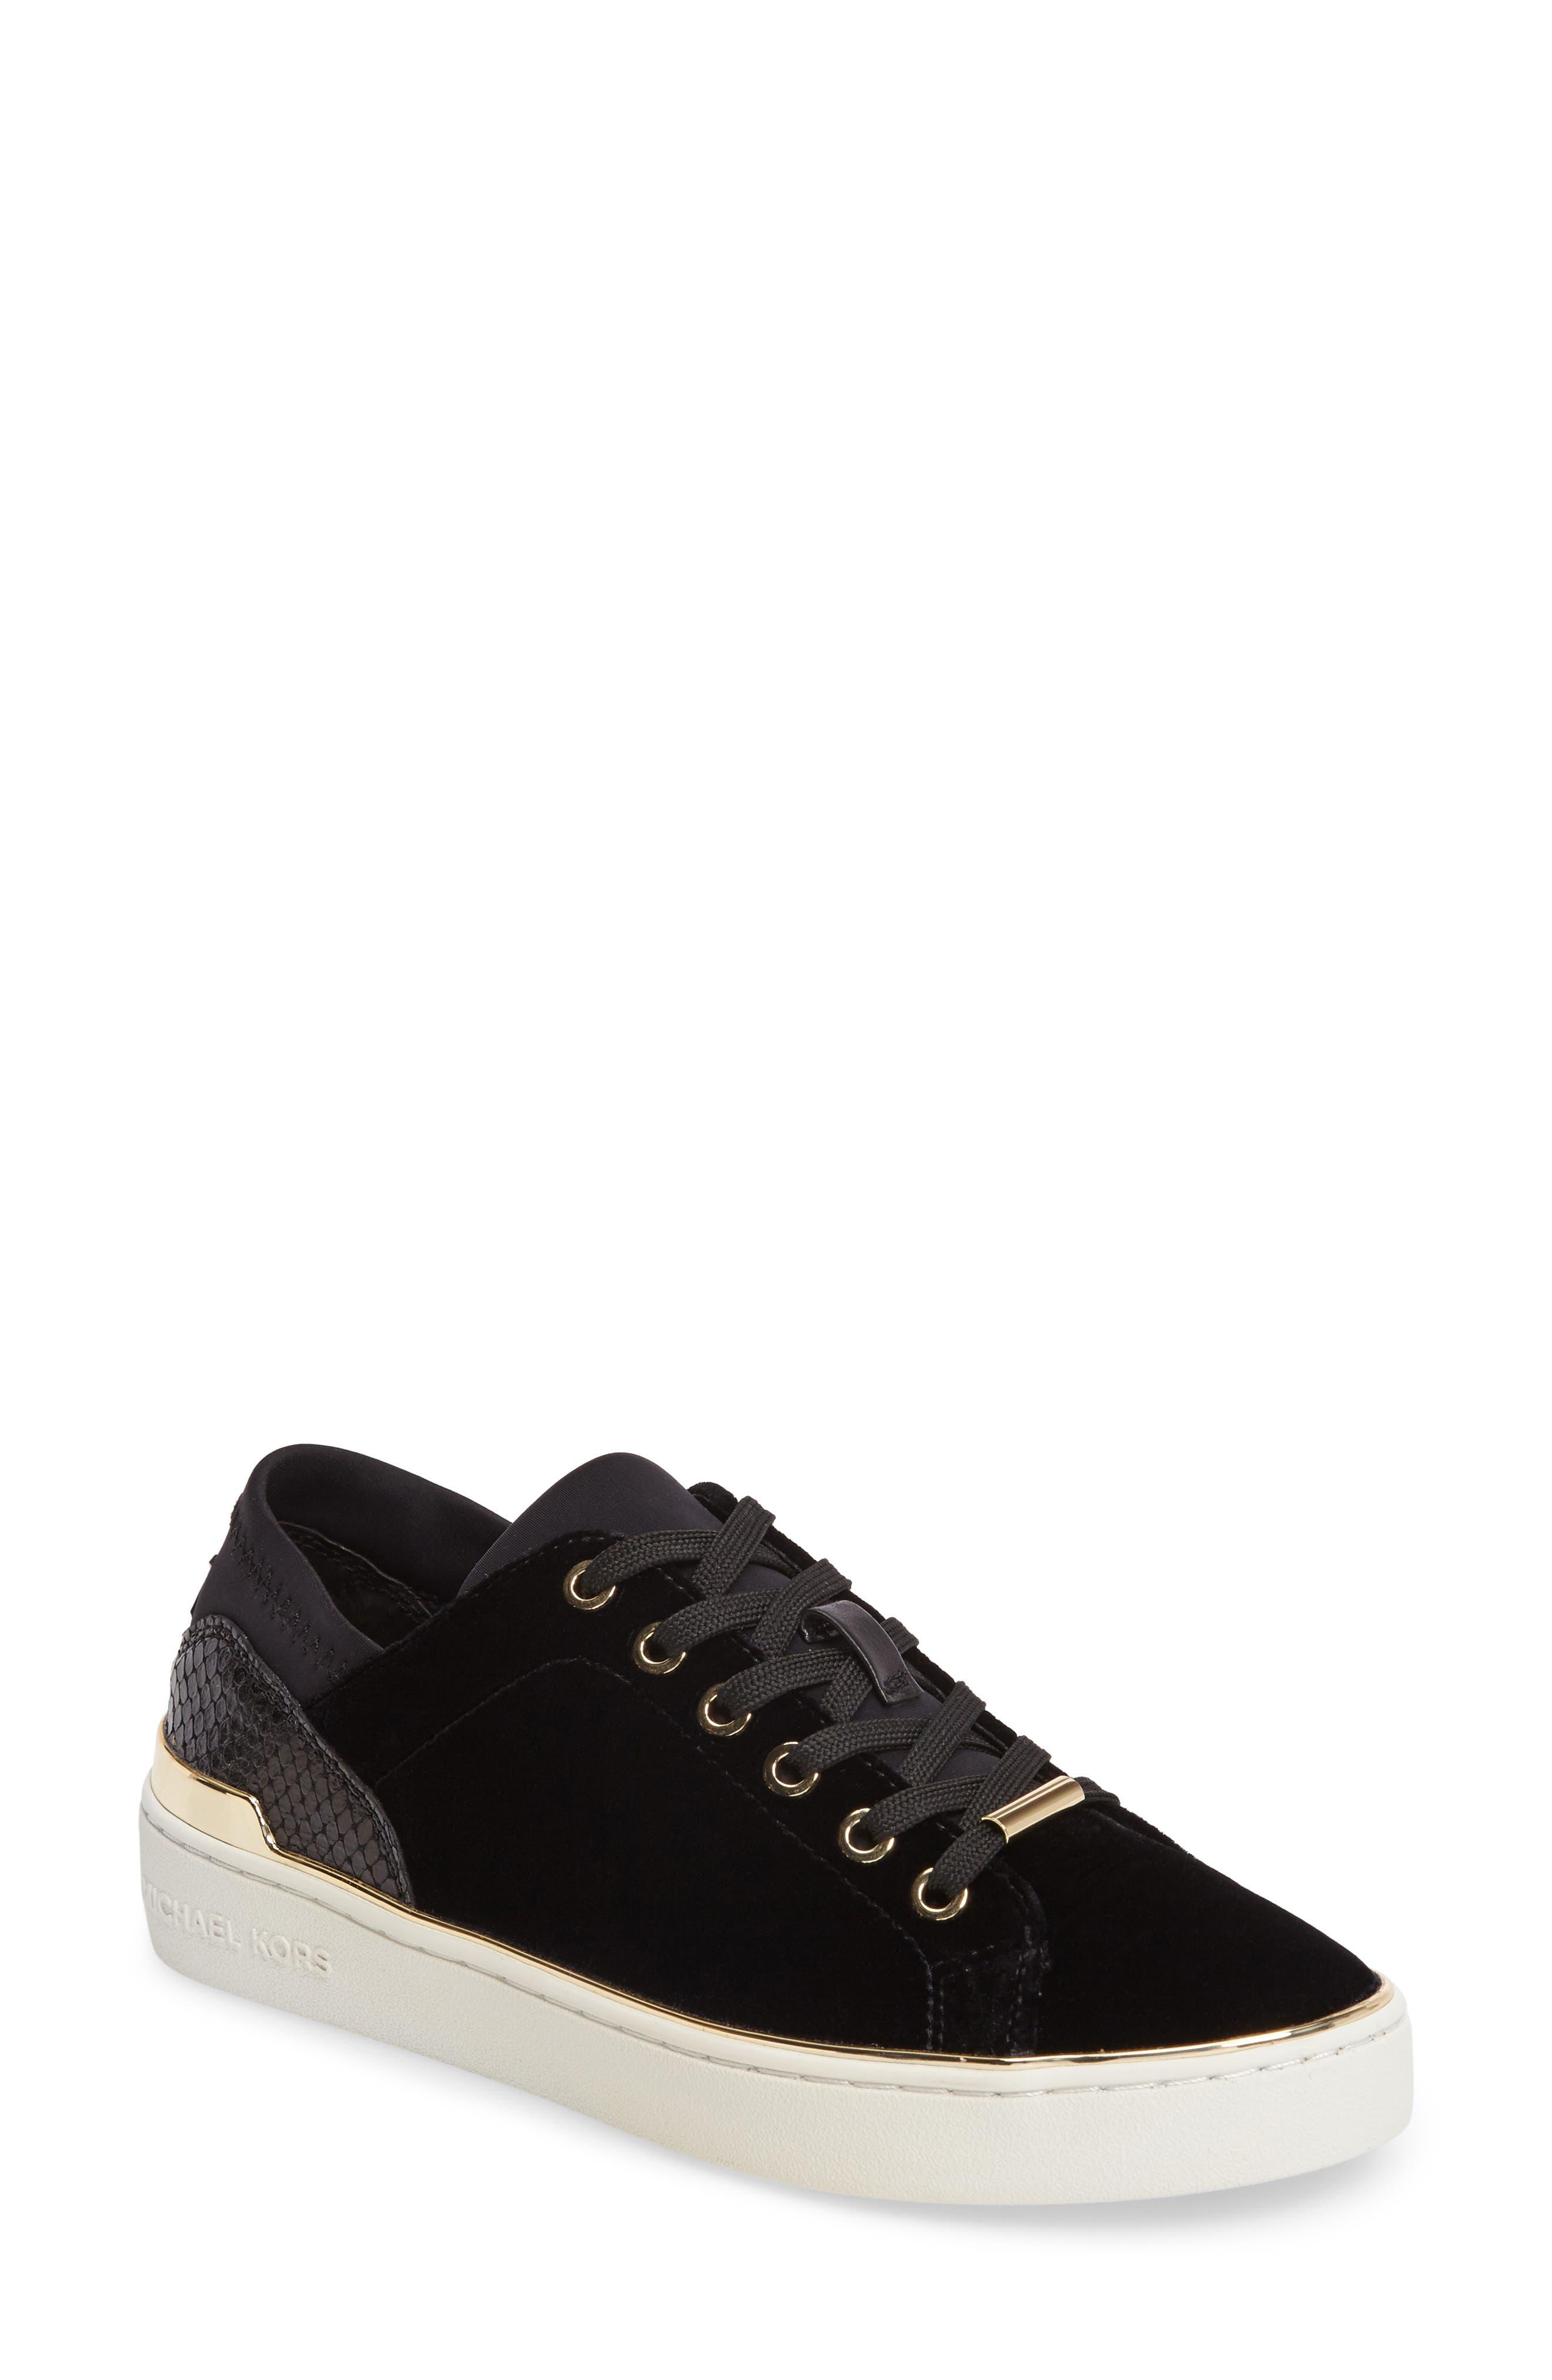 Scout Sneaker,                             Main thumbnail 1, color,                             Black